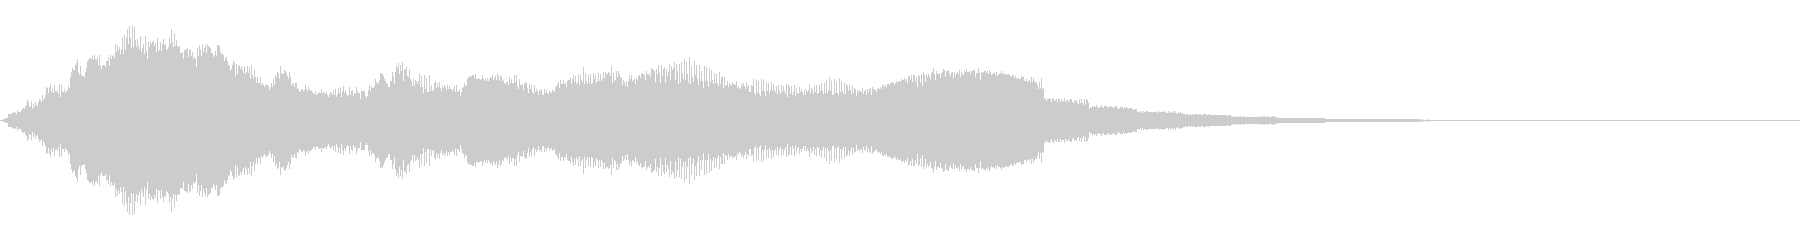 NU外観の未再生の波形